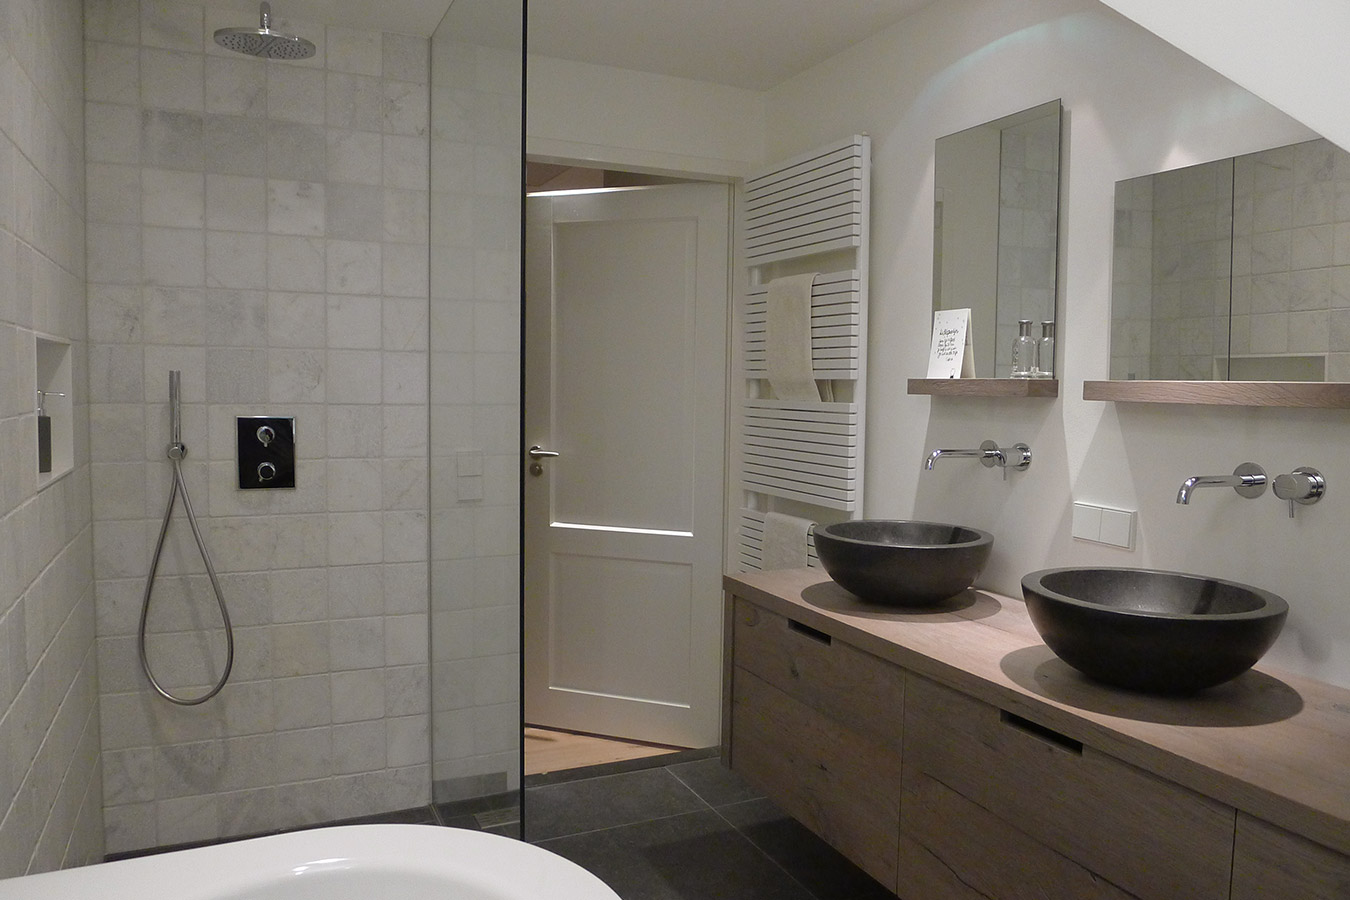 Badkamer Ontwerp Ideeen : Badkamer ontwerpen u artsmedia